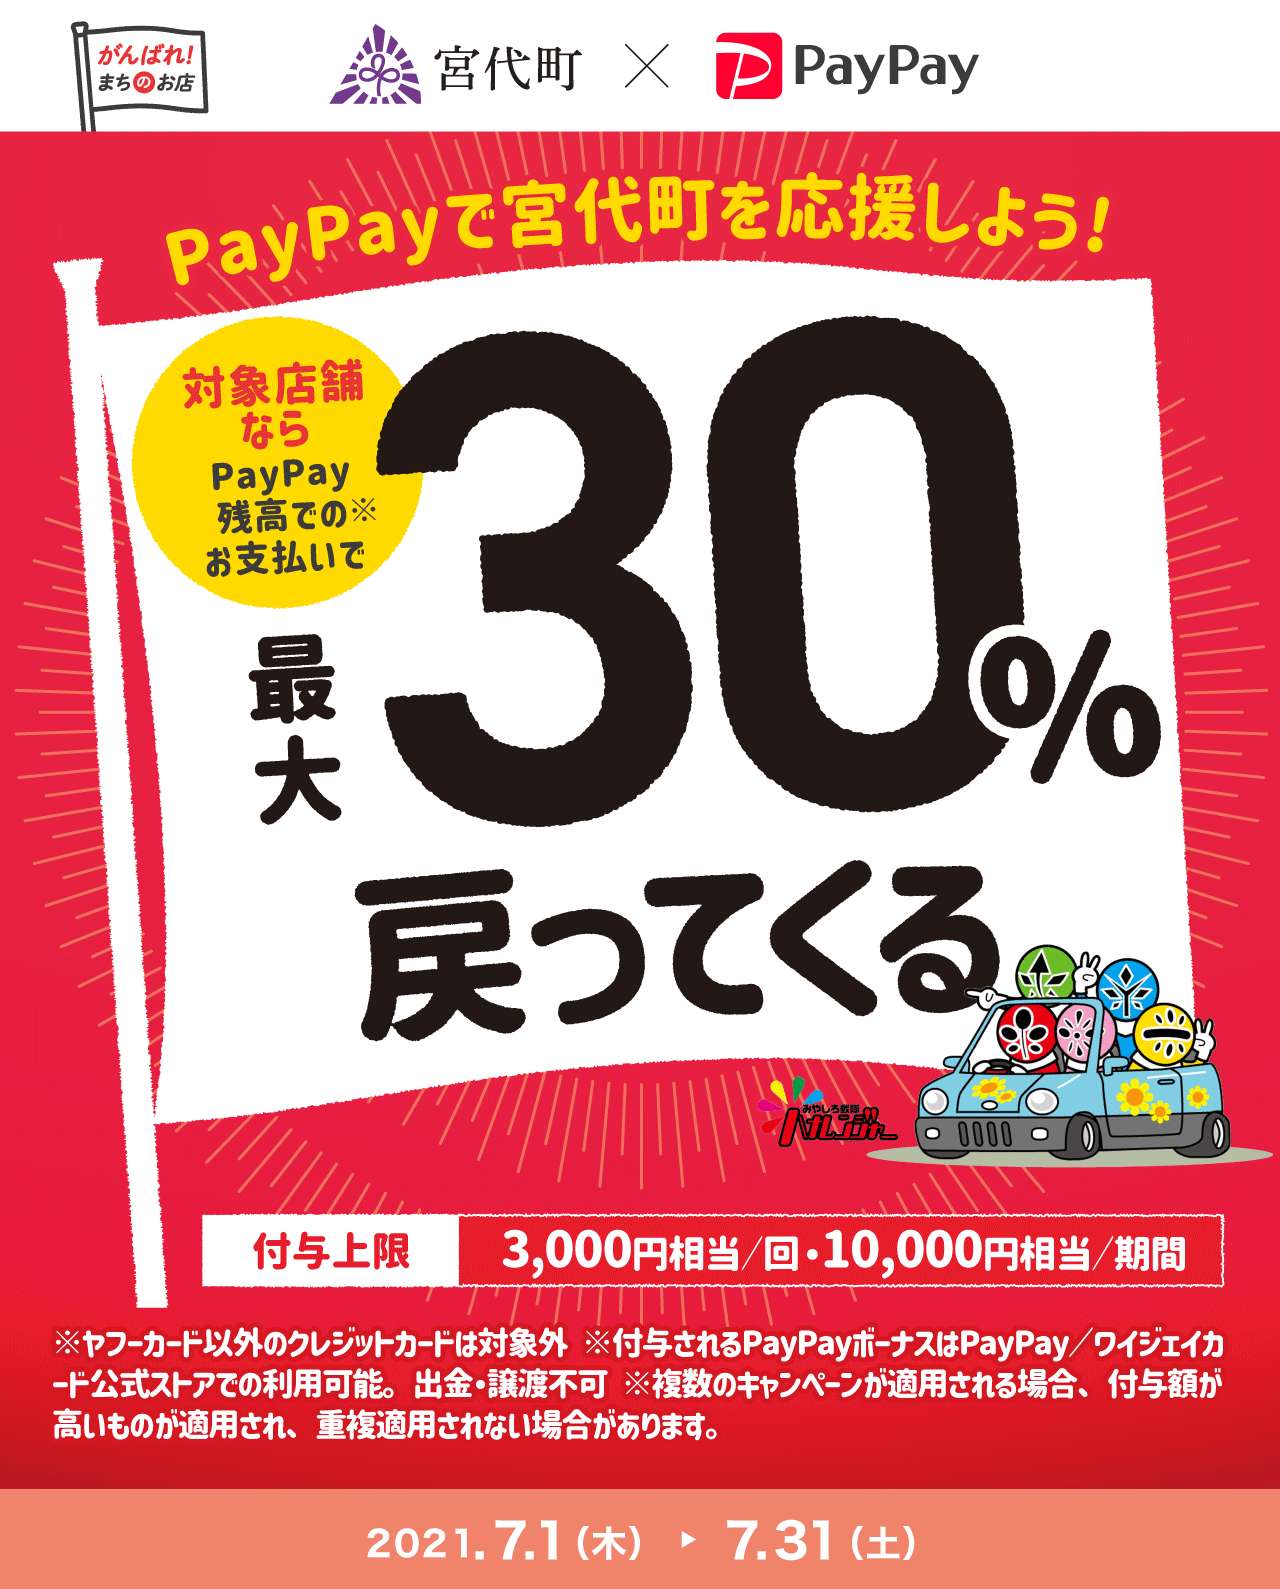 PayPayで宮代町を応援しよう!対象店舗ならPayPay残高でのお支払いで最大30%戻ってくる